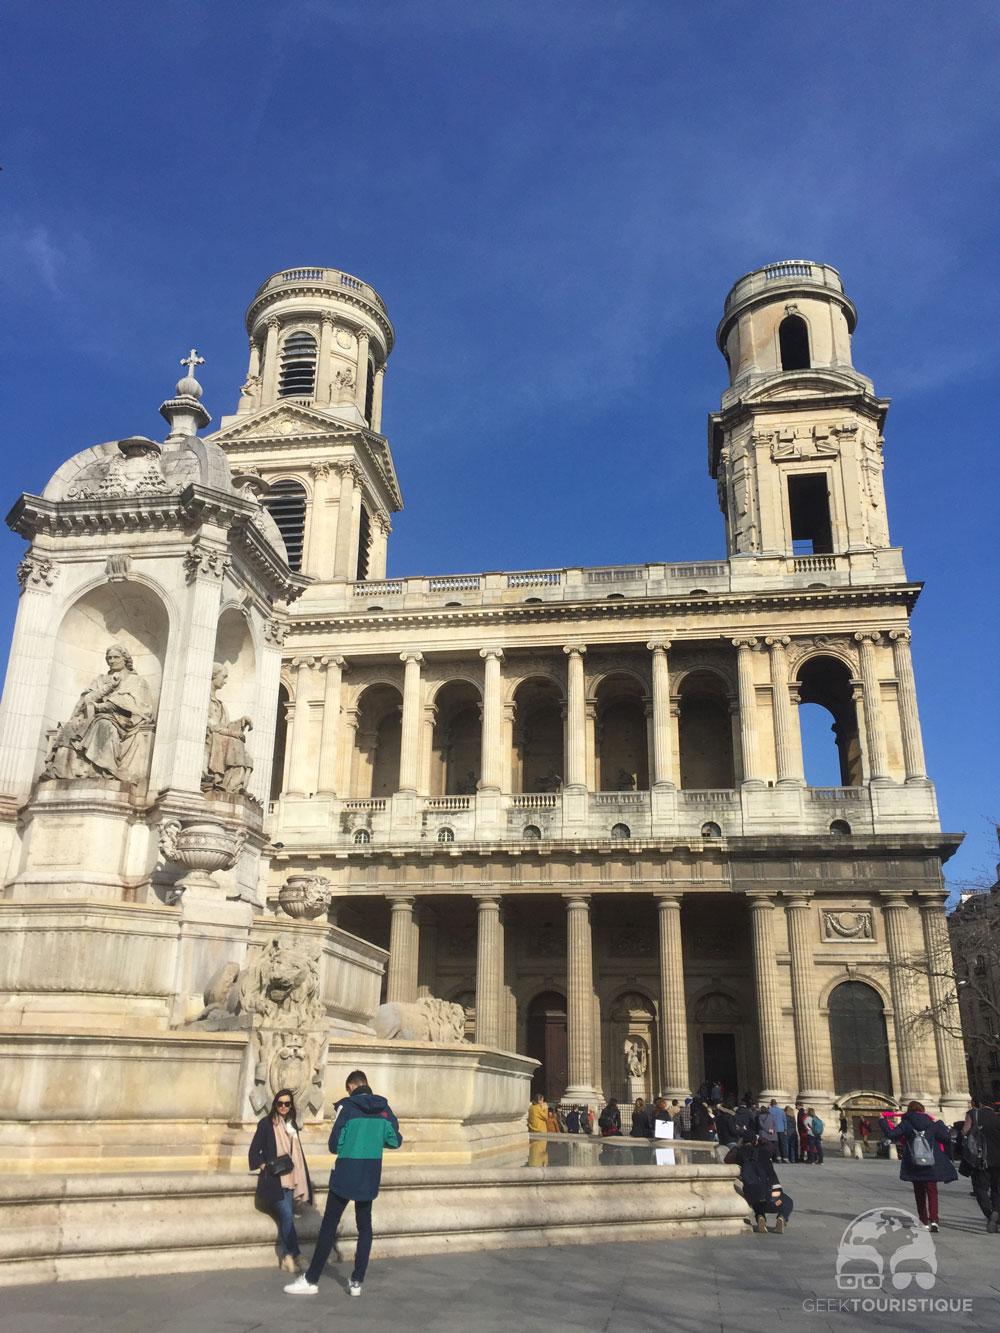 Geektouristique-Paris6